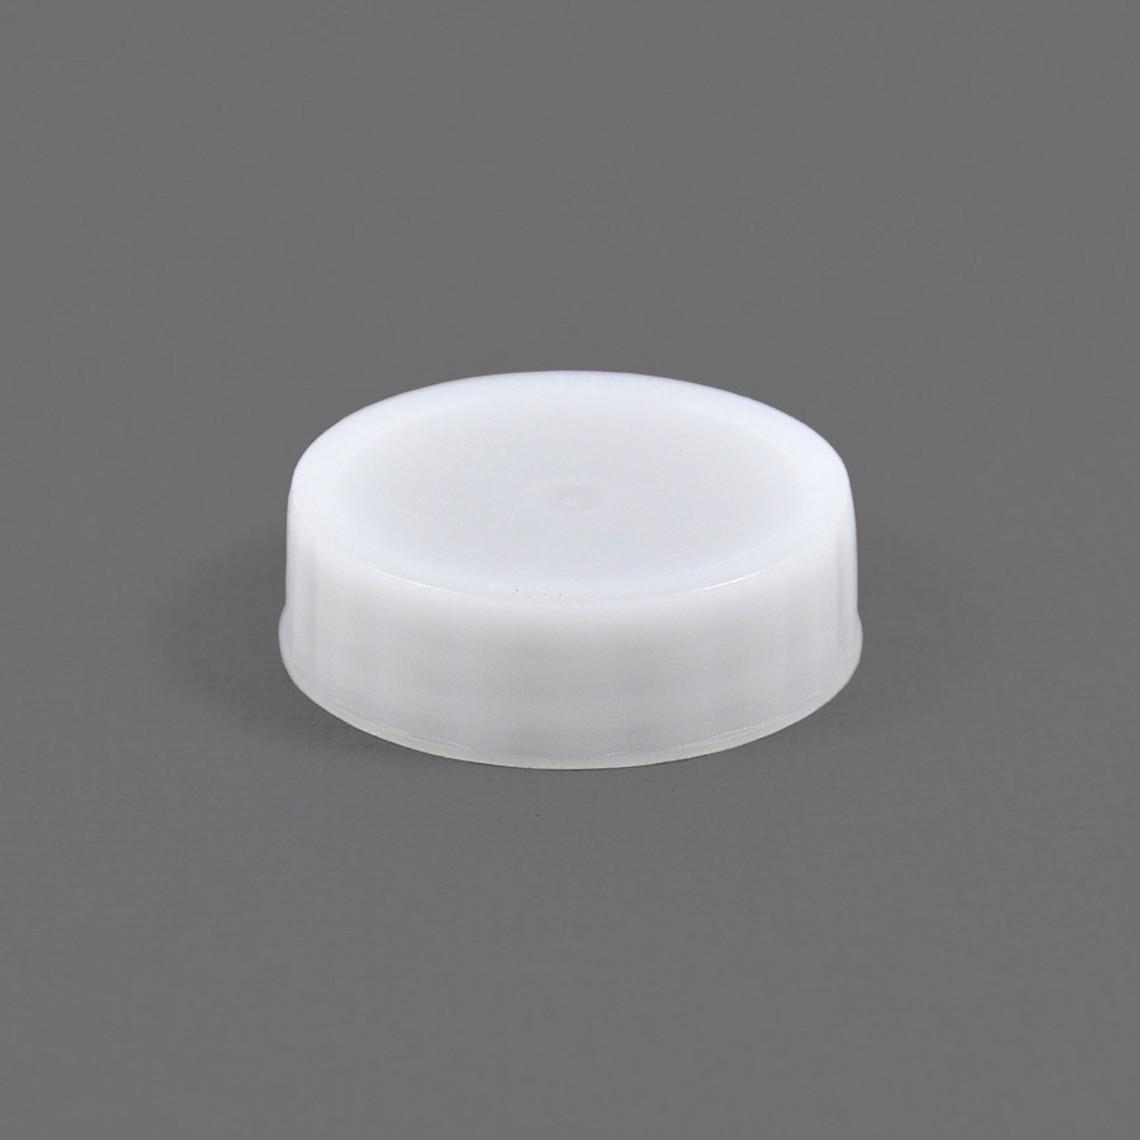 FIFO BOTTLE™ Label Cap - White